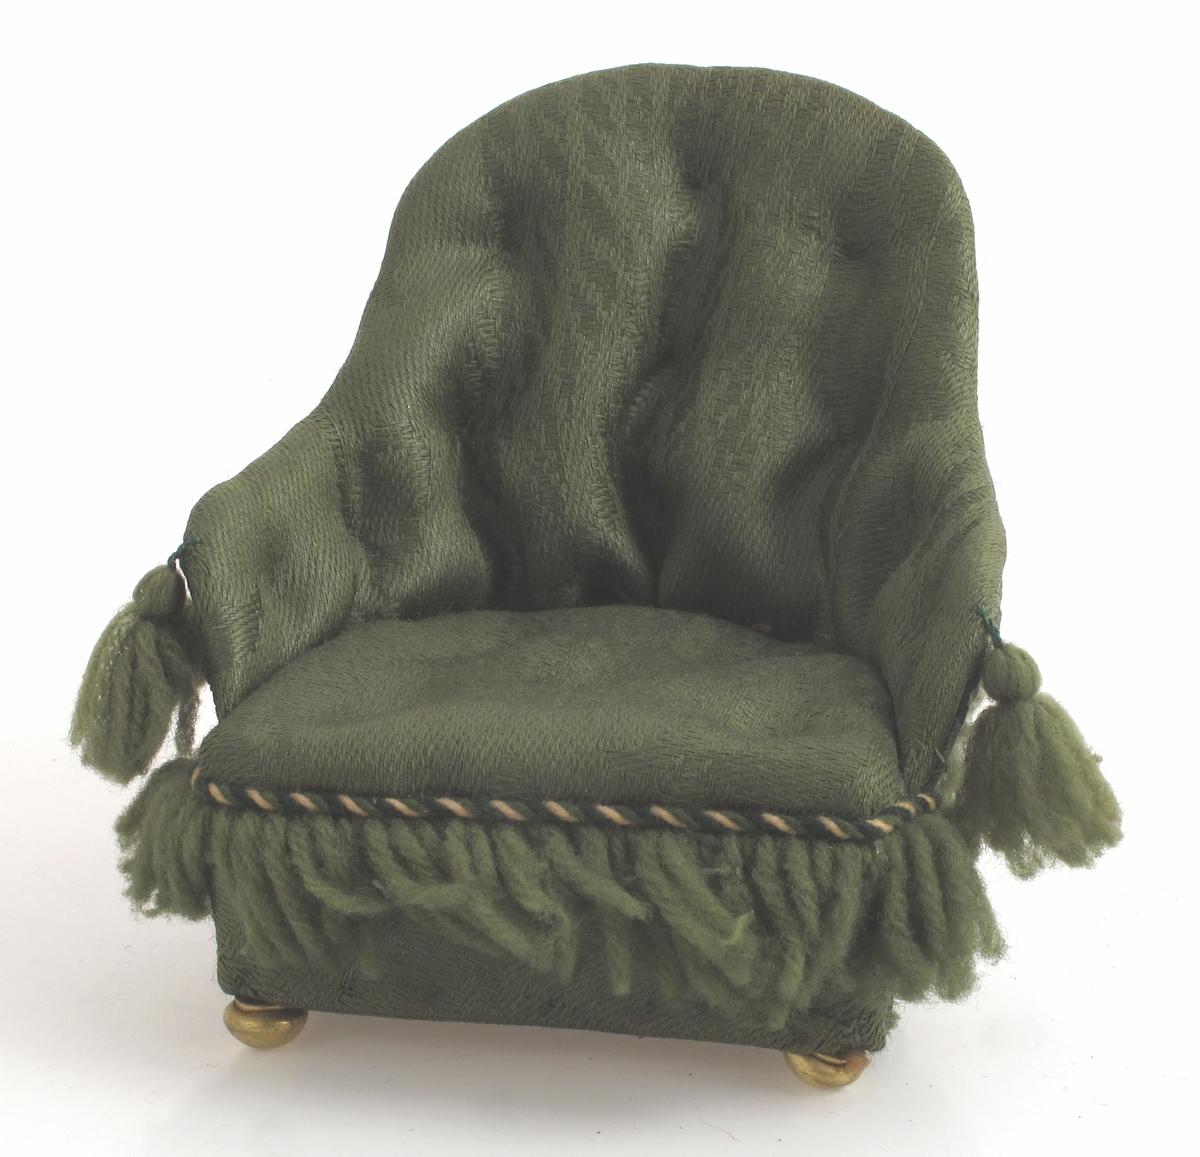 Lenestol trukket med grønn ulldamask.  Ullfrynser